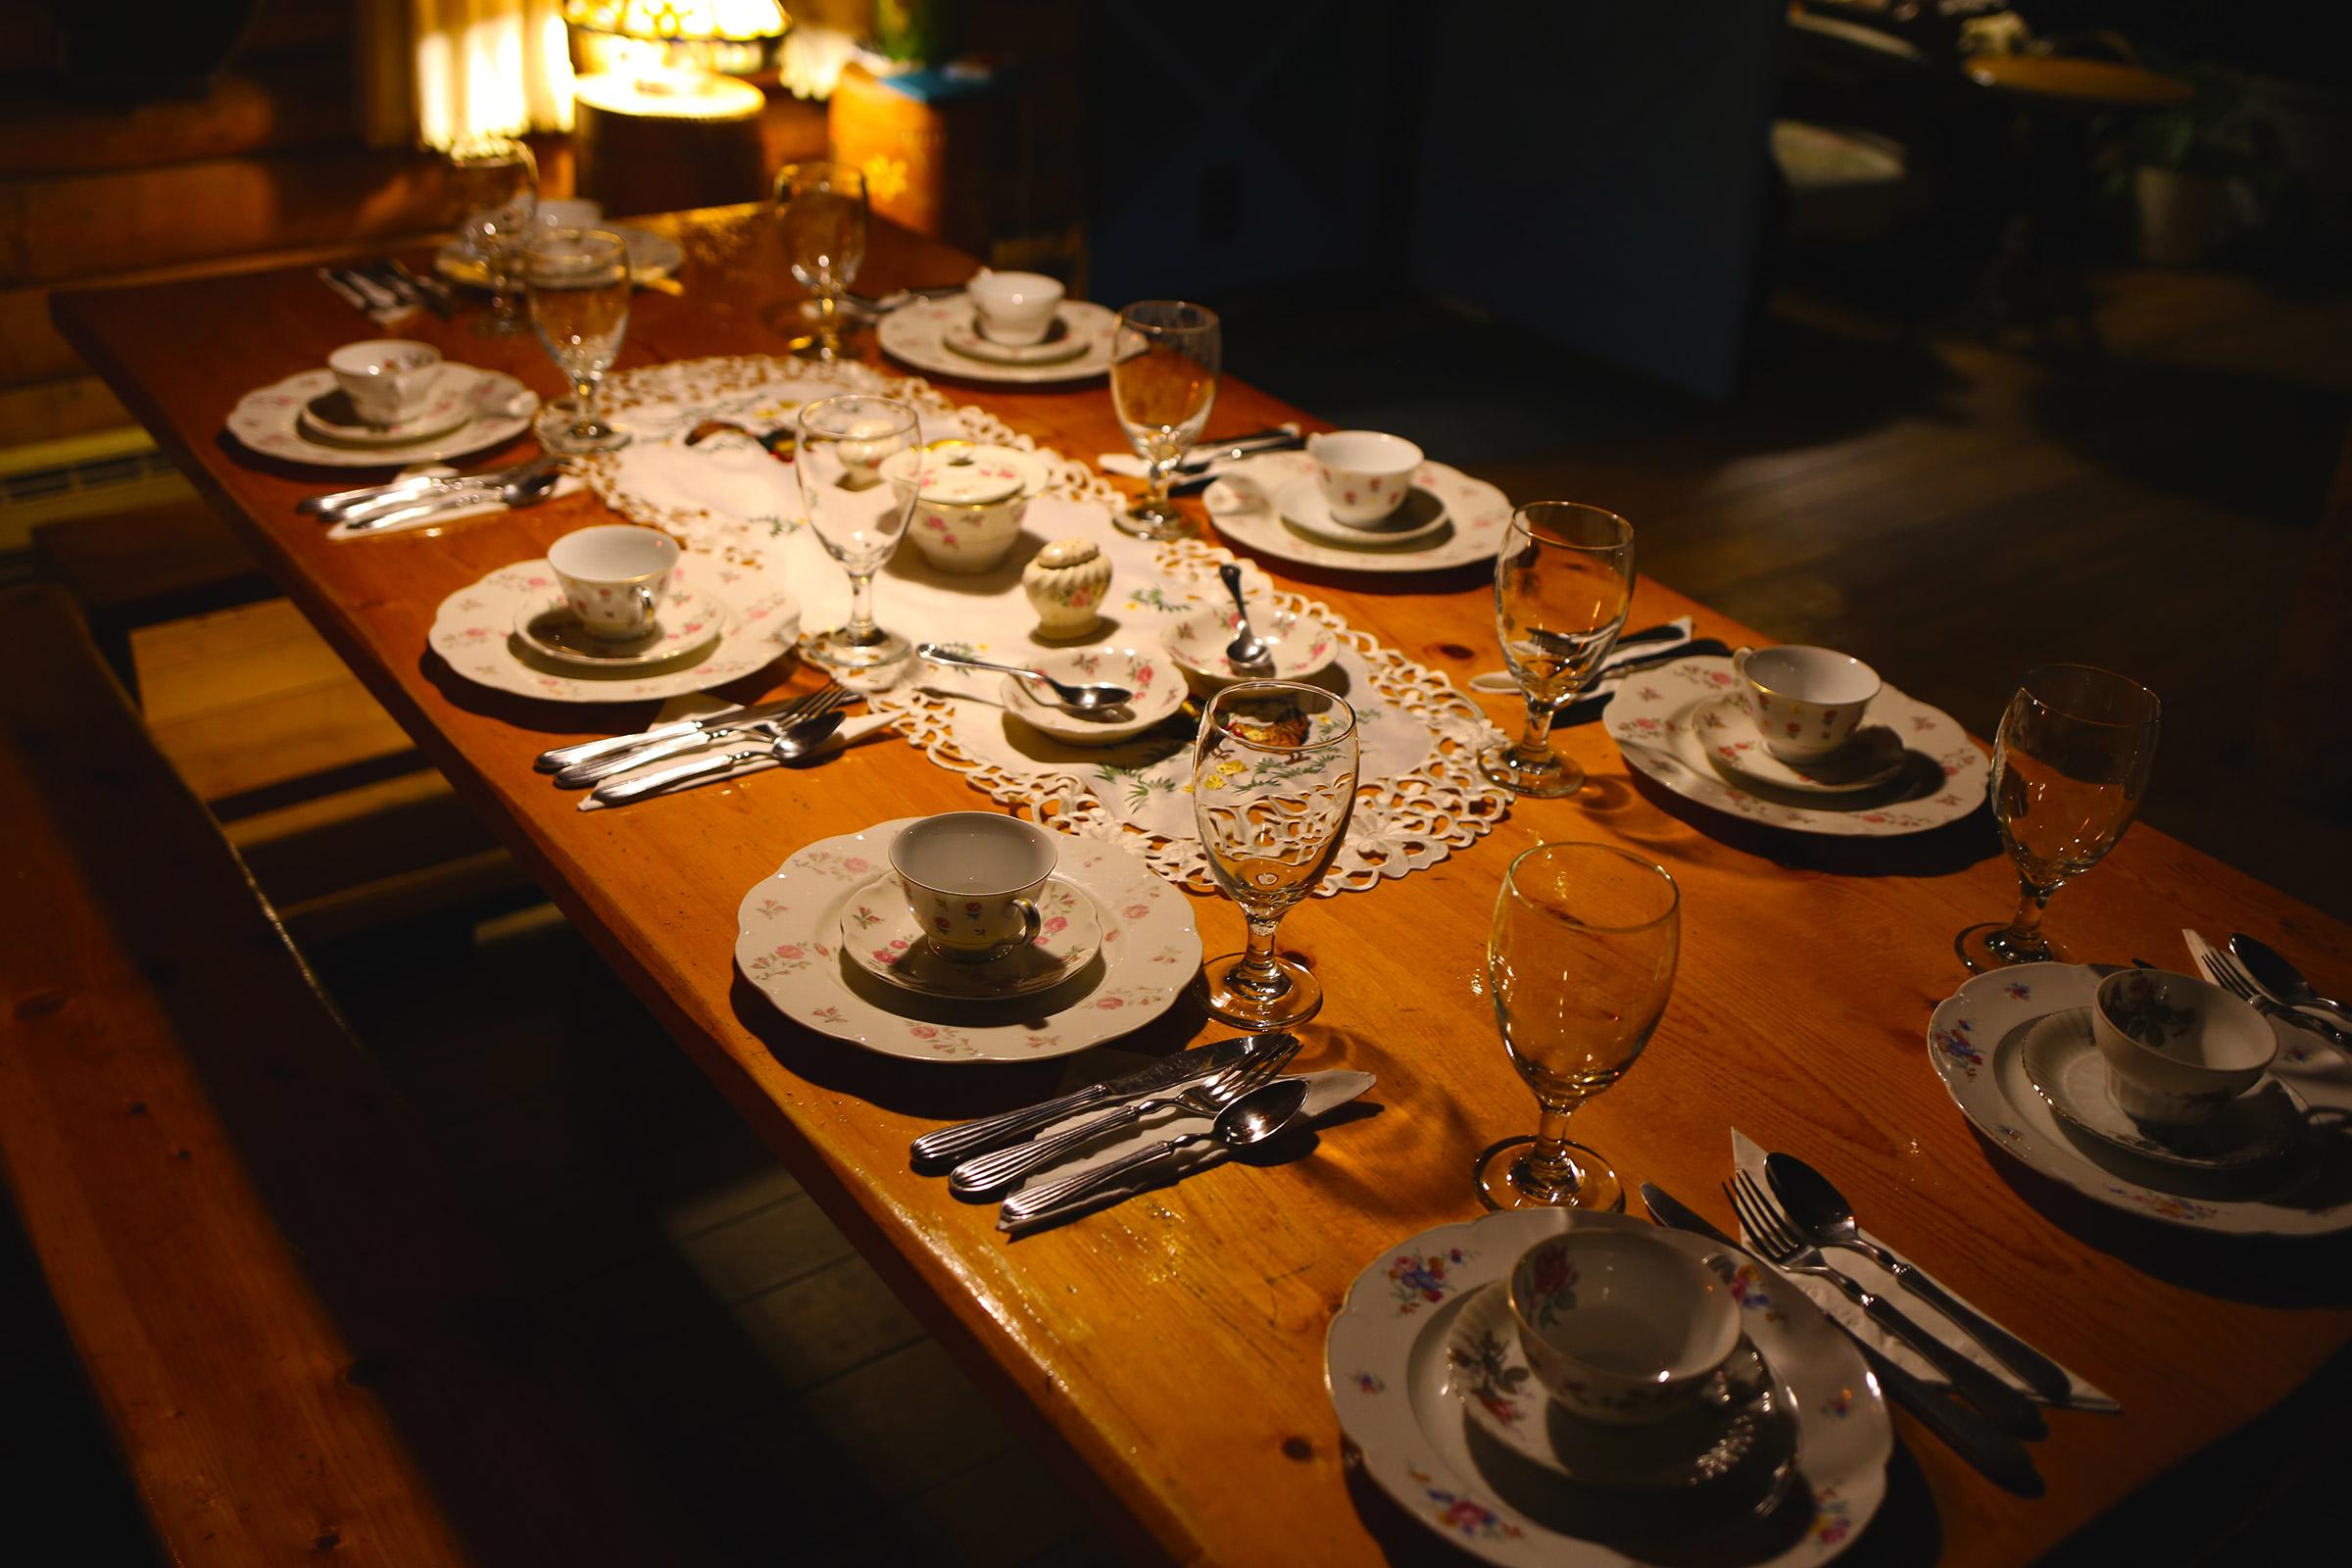 Log Country Inn B&B of Ithaca - Breakfast Table